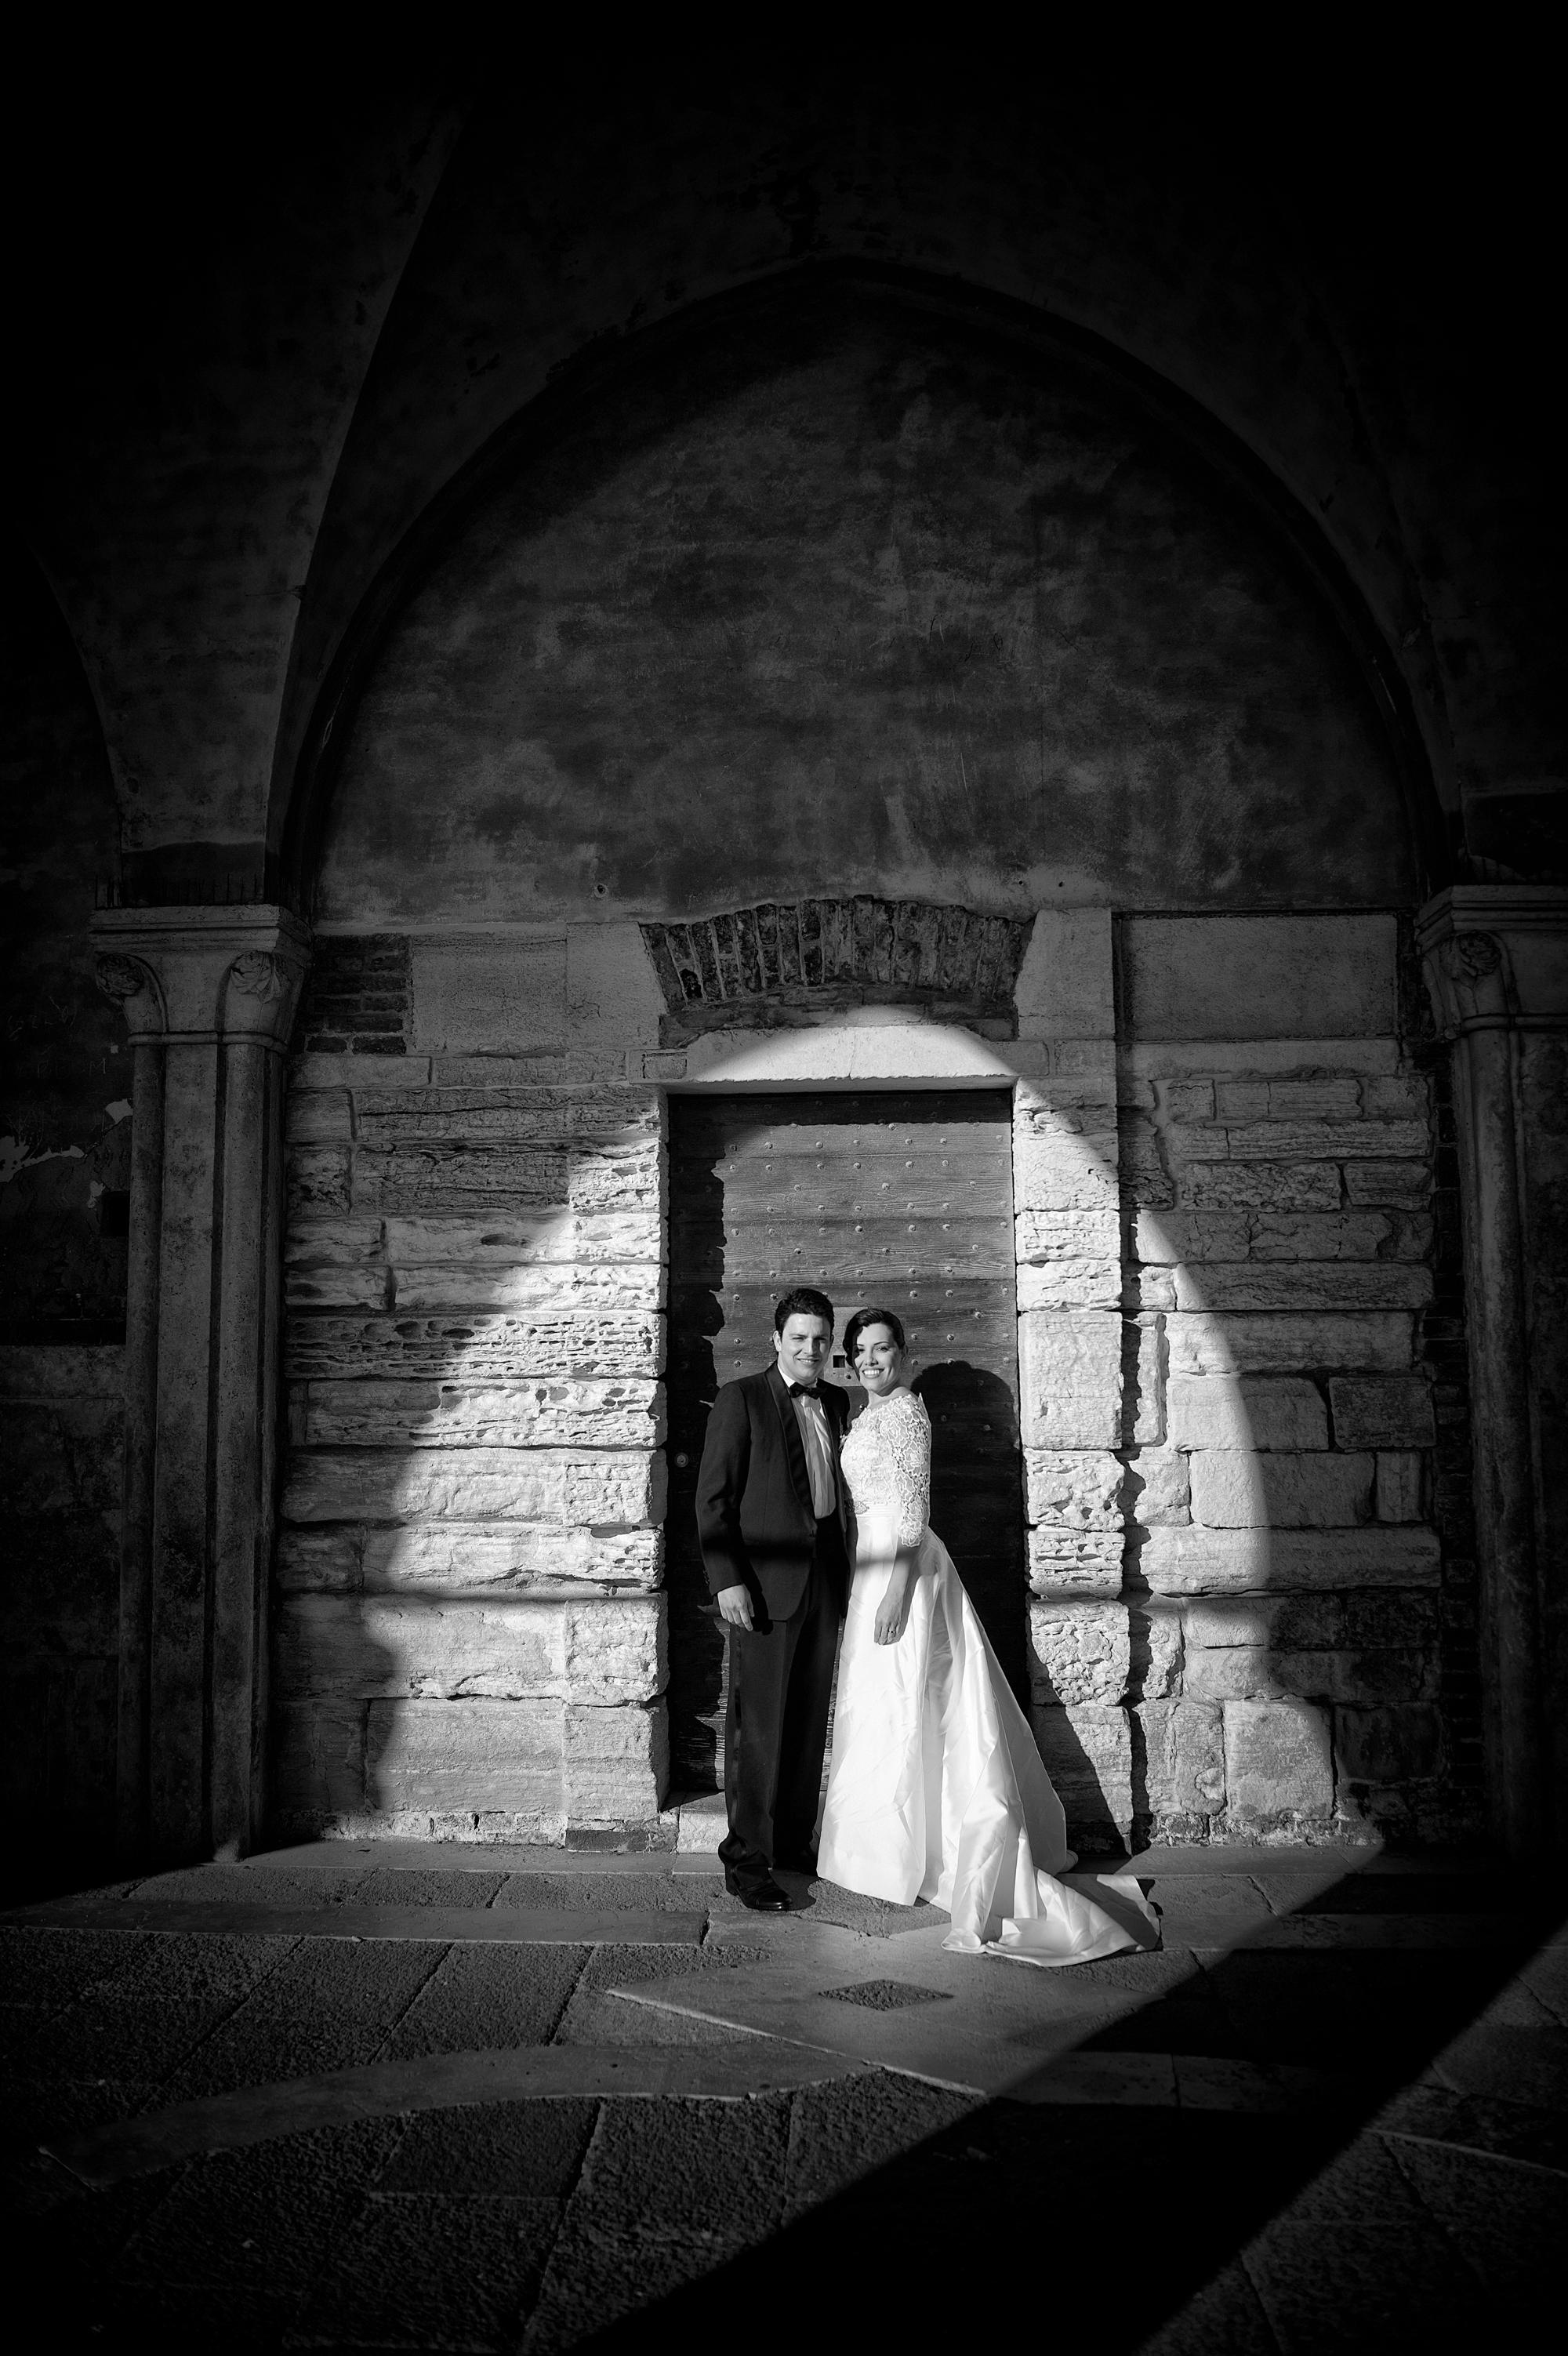 venezia matrimonio simbolico fotografia carmini laure jacquemin fotografo (77)